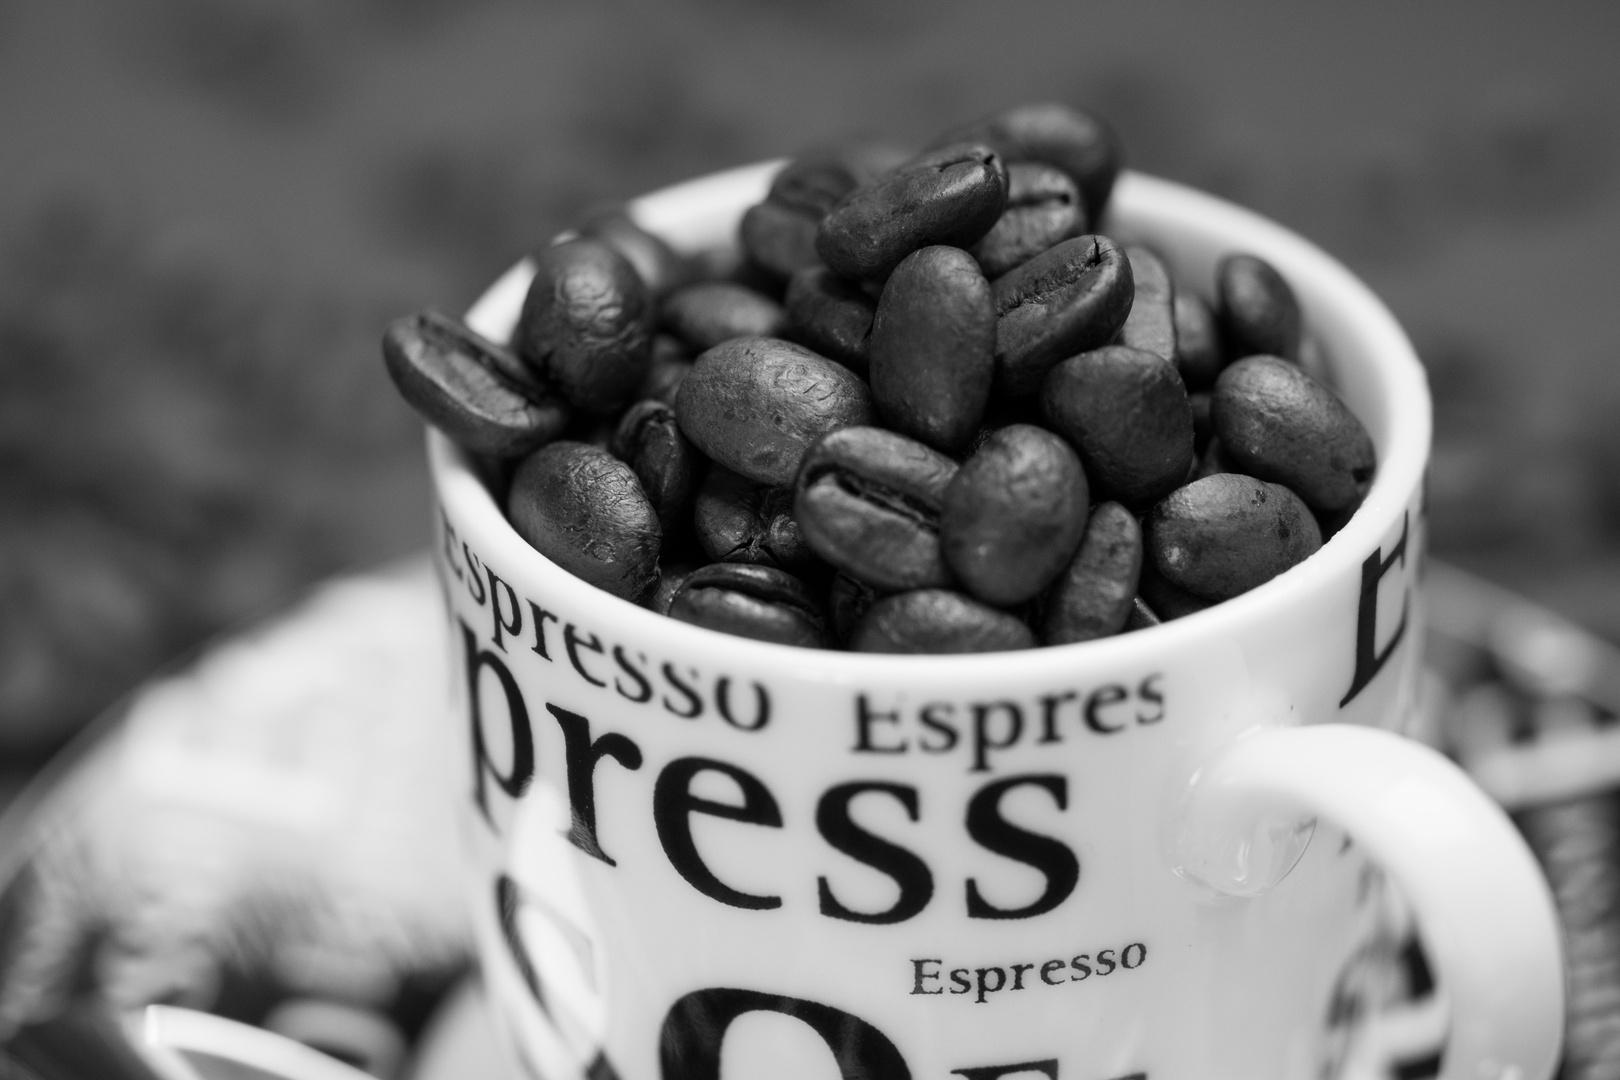 COFFEE T!ME...